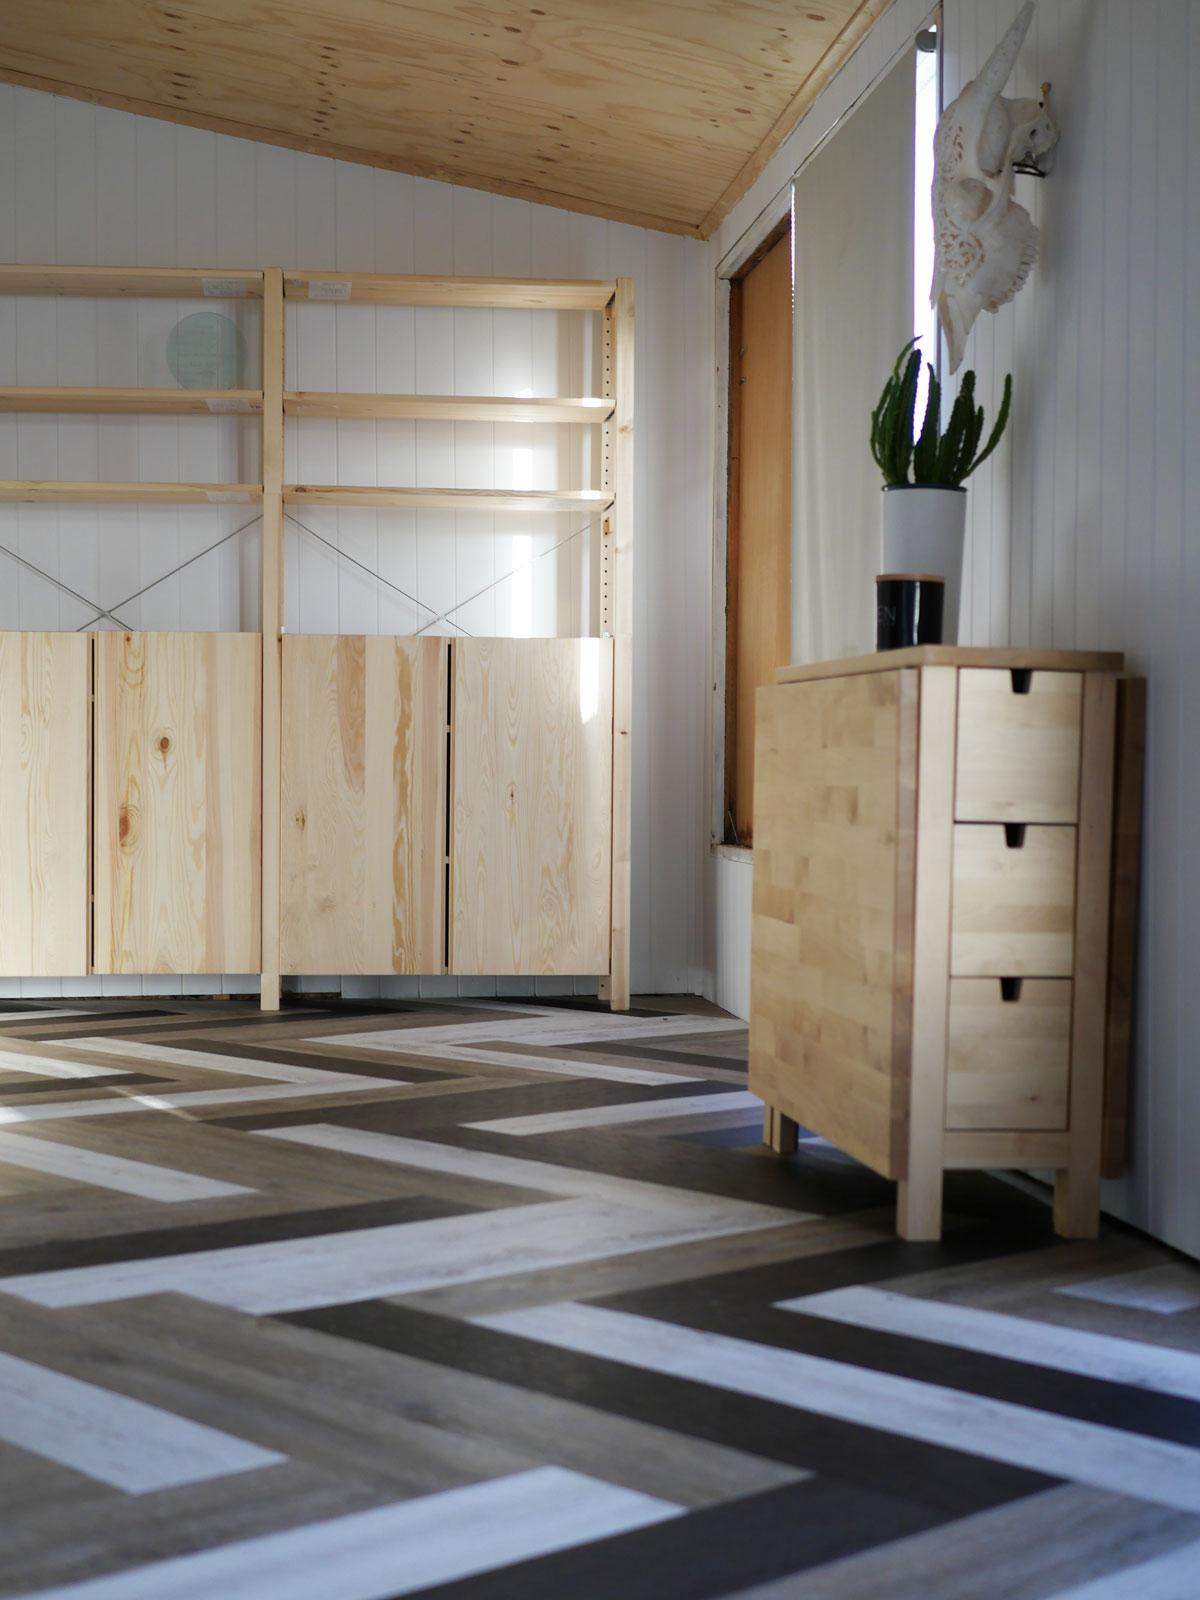 How to herringbone floor